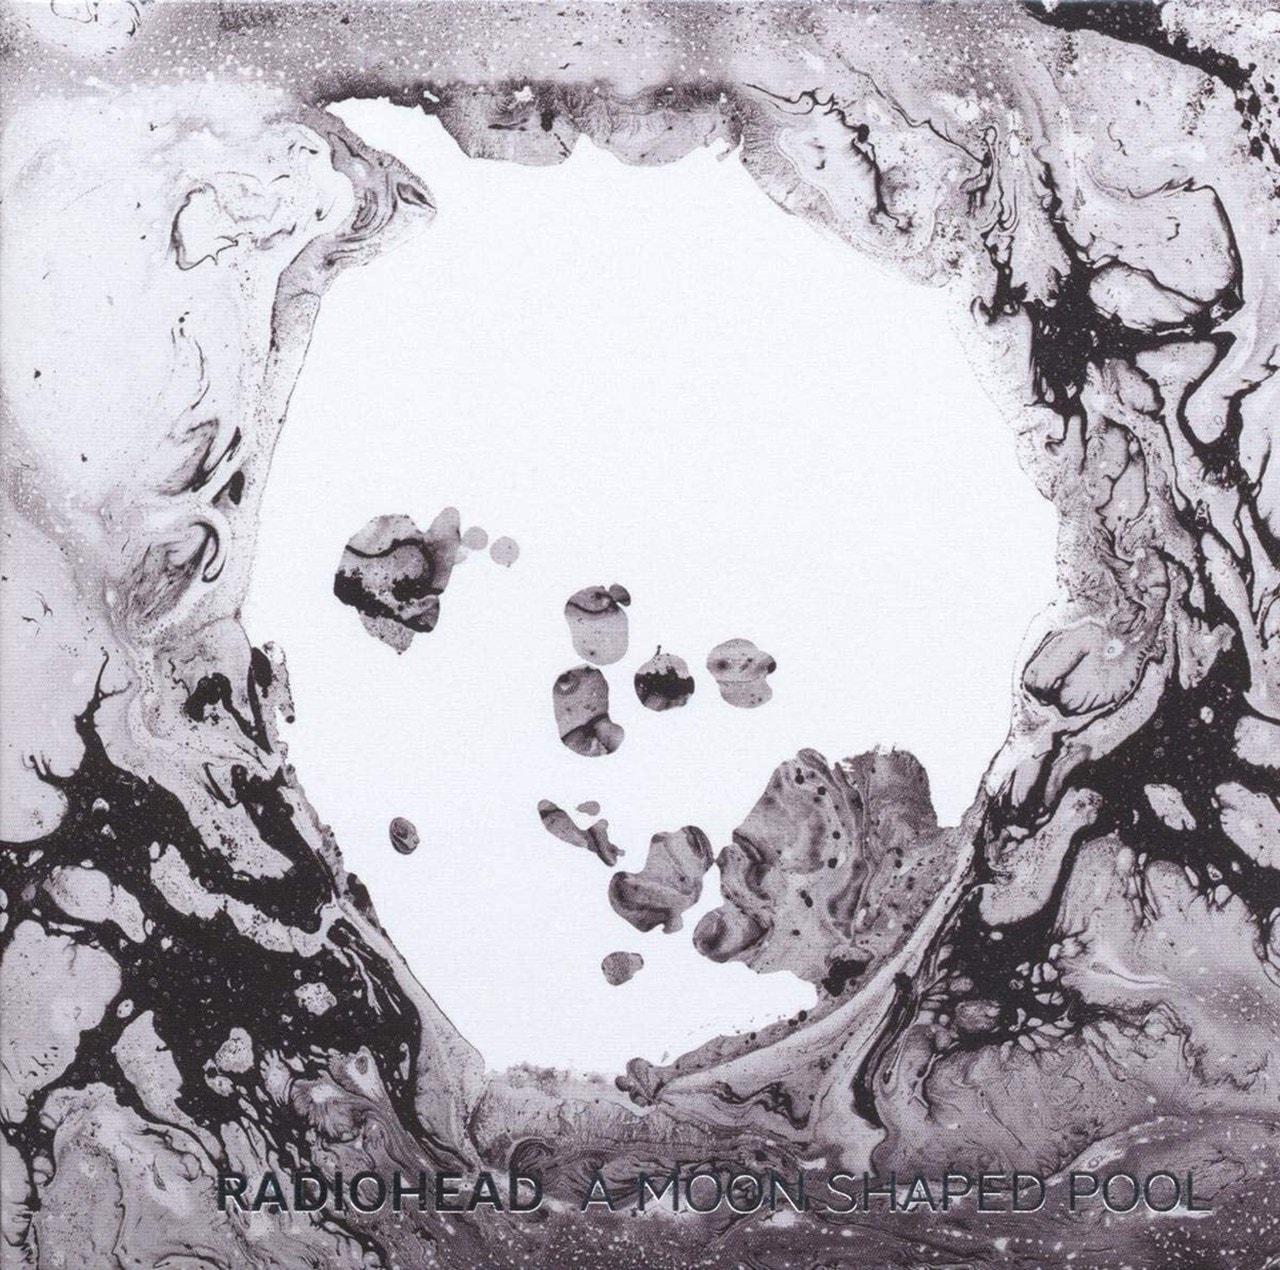 A Moon Shaped Pool - White Vinyl (LRS20) - 1